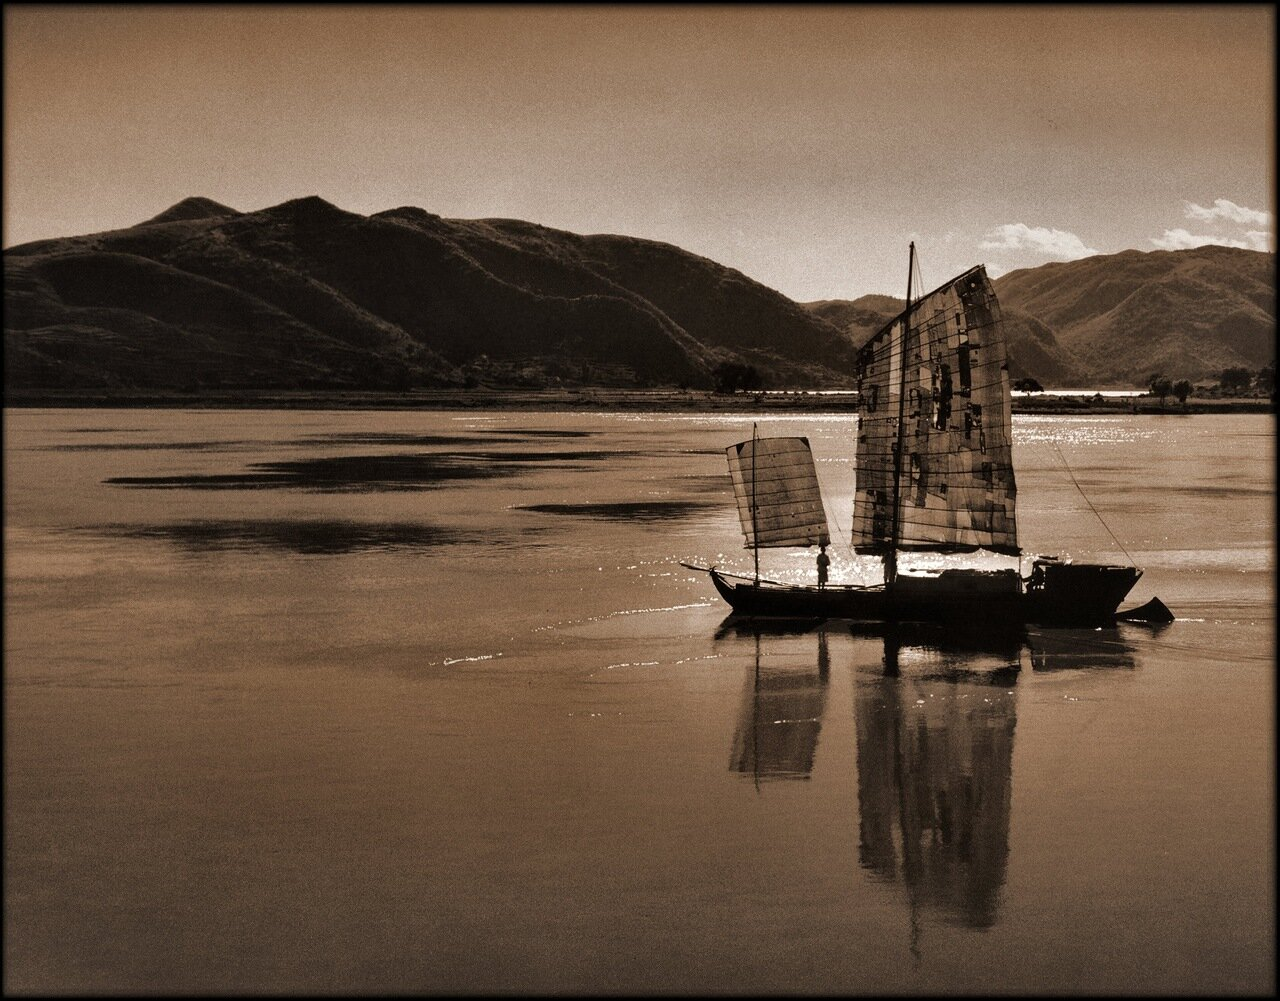 1946. Лодка на реке. Провинции Цзянсу или Сычуань.